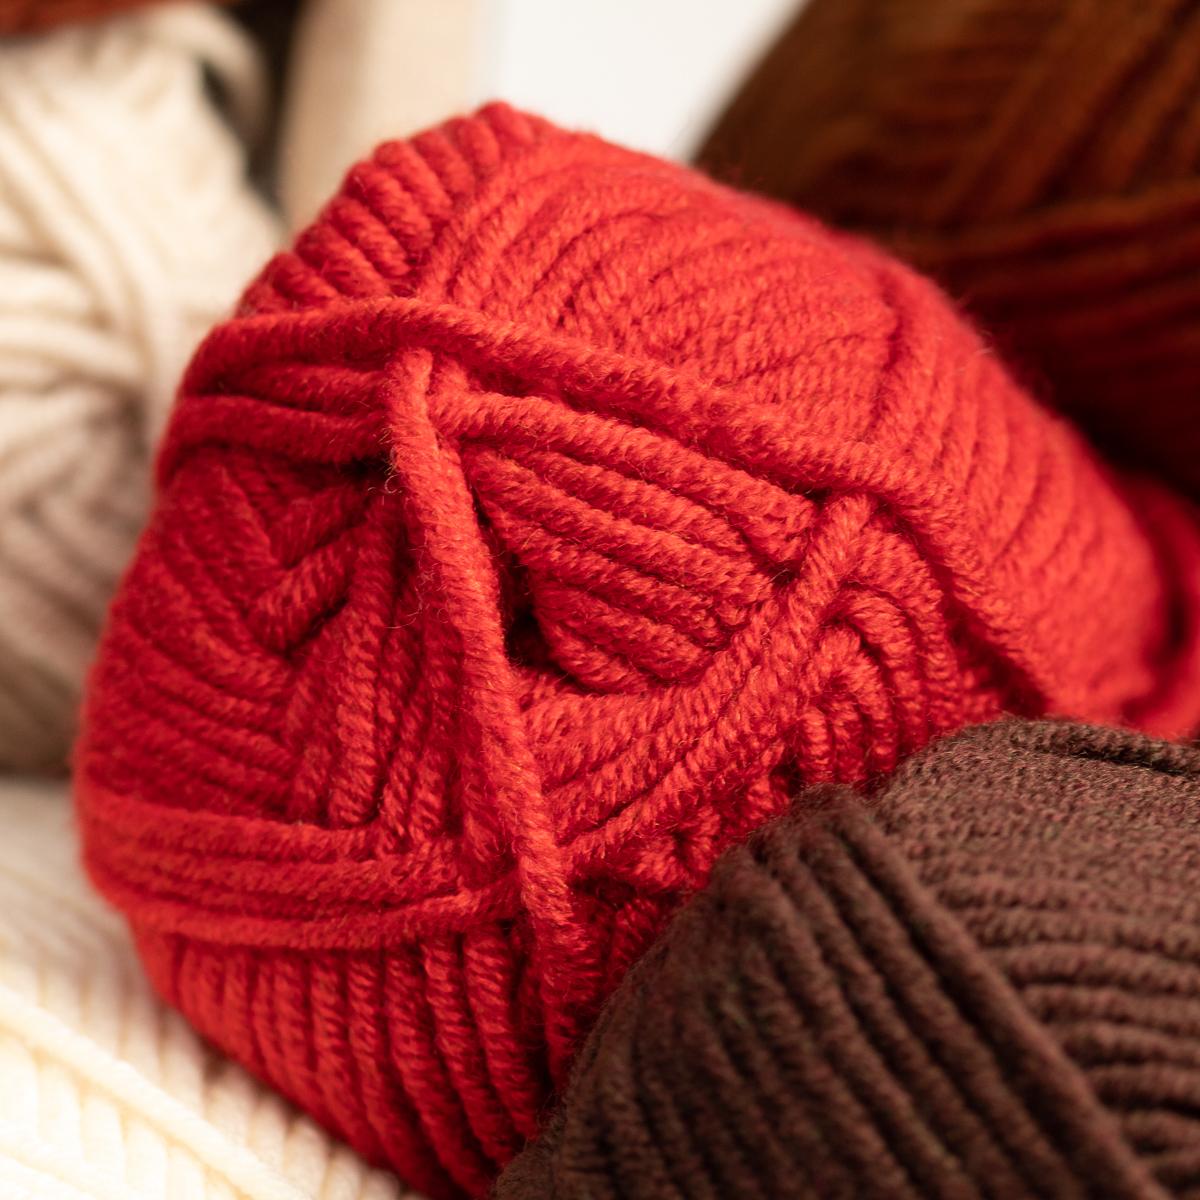 3pk-Lion-Brand-Woolspun-Acrylic-amp-Wool-Yarn-Bulky-5-Knit-Crocheting-Skeins-Soft thumbnail 74